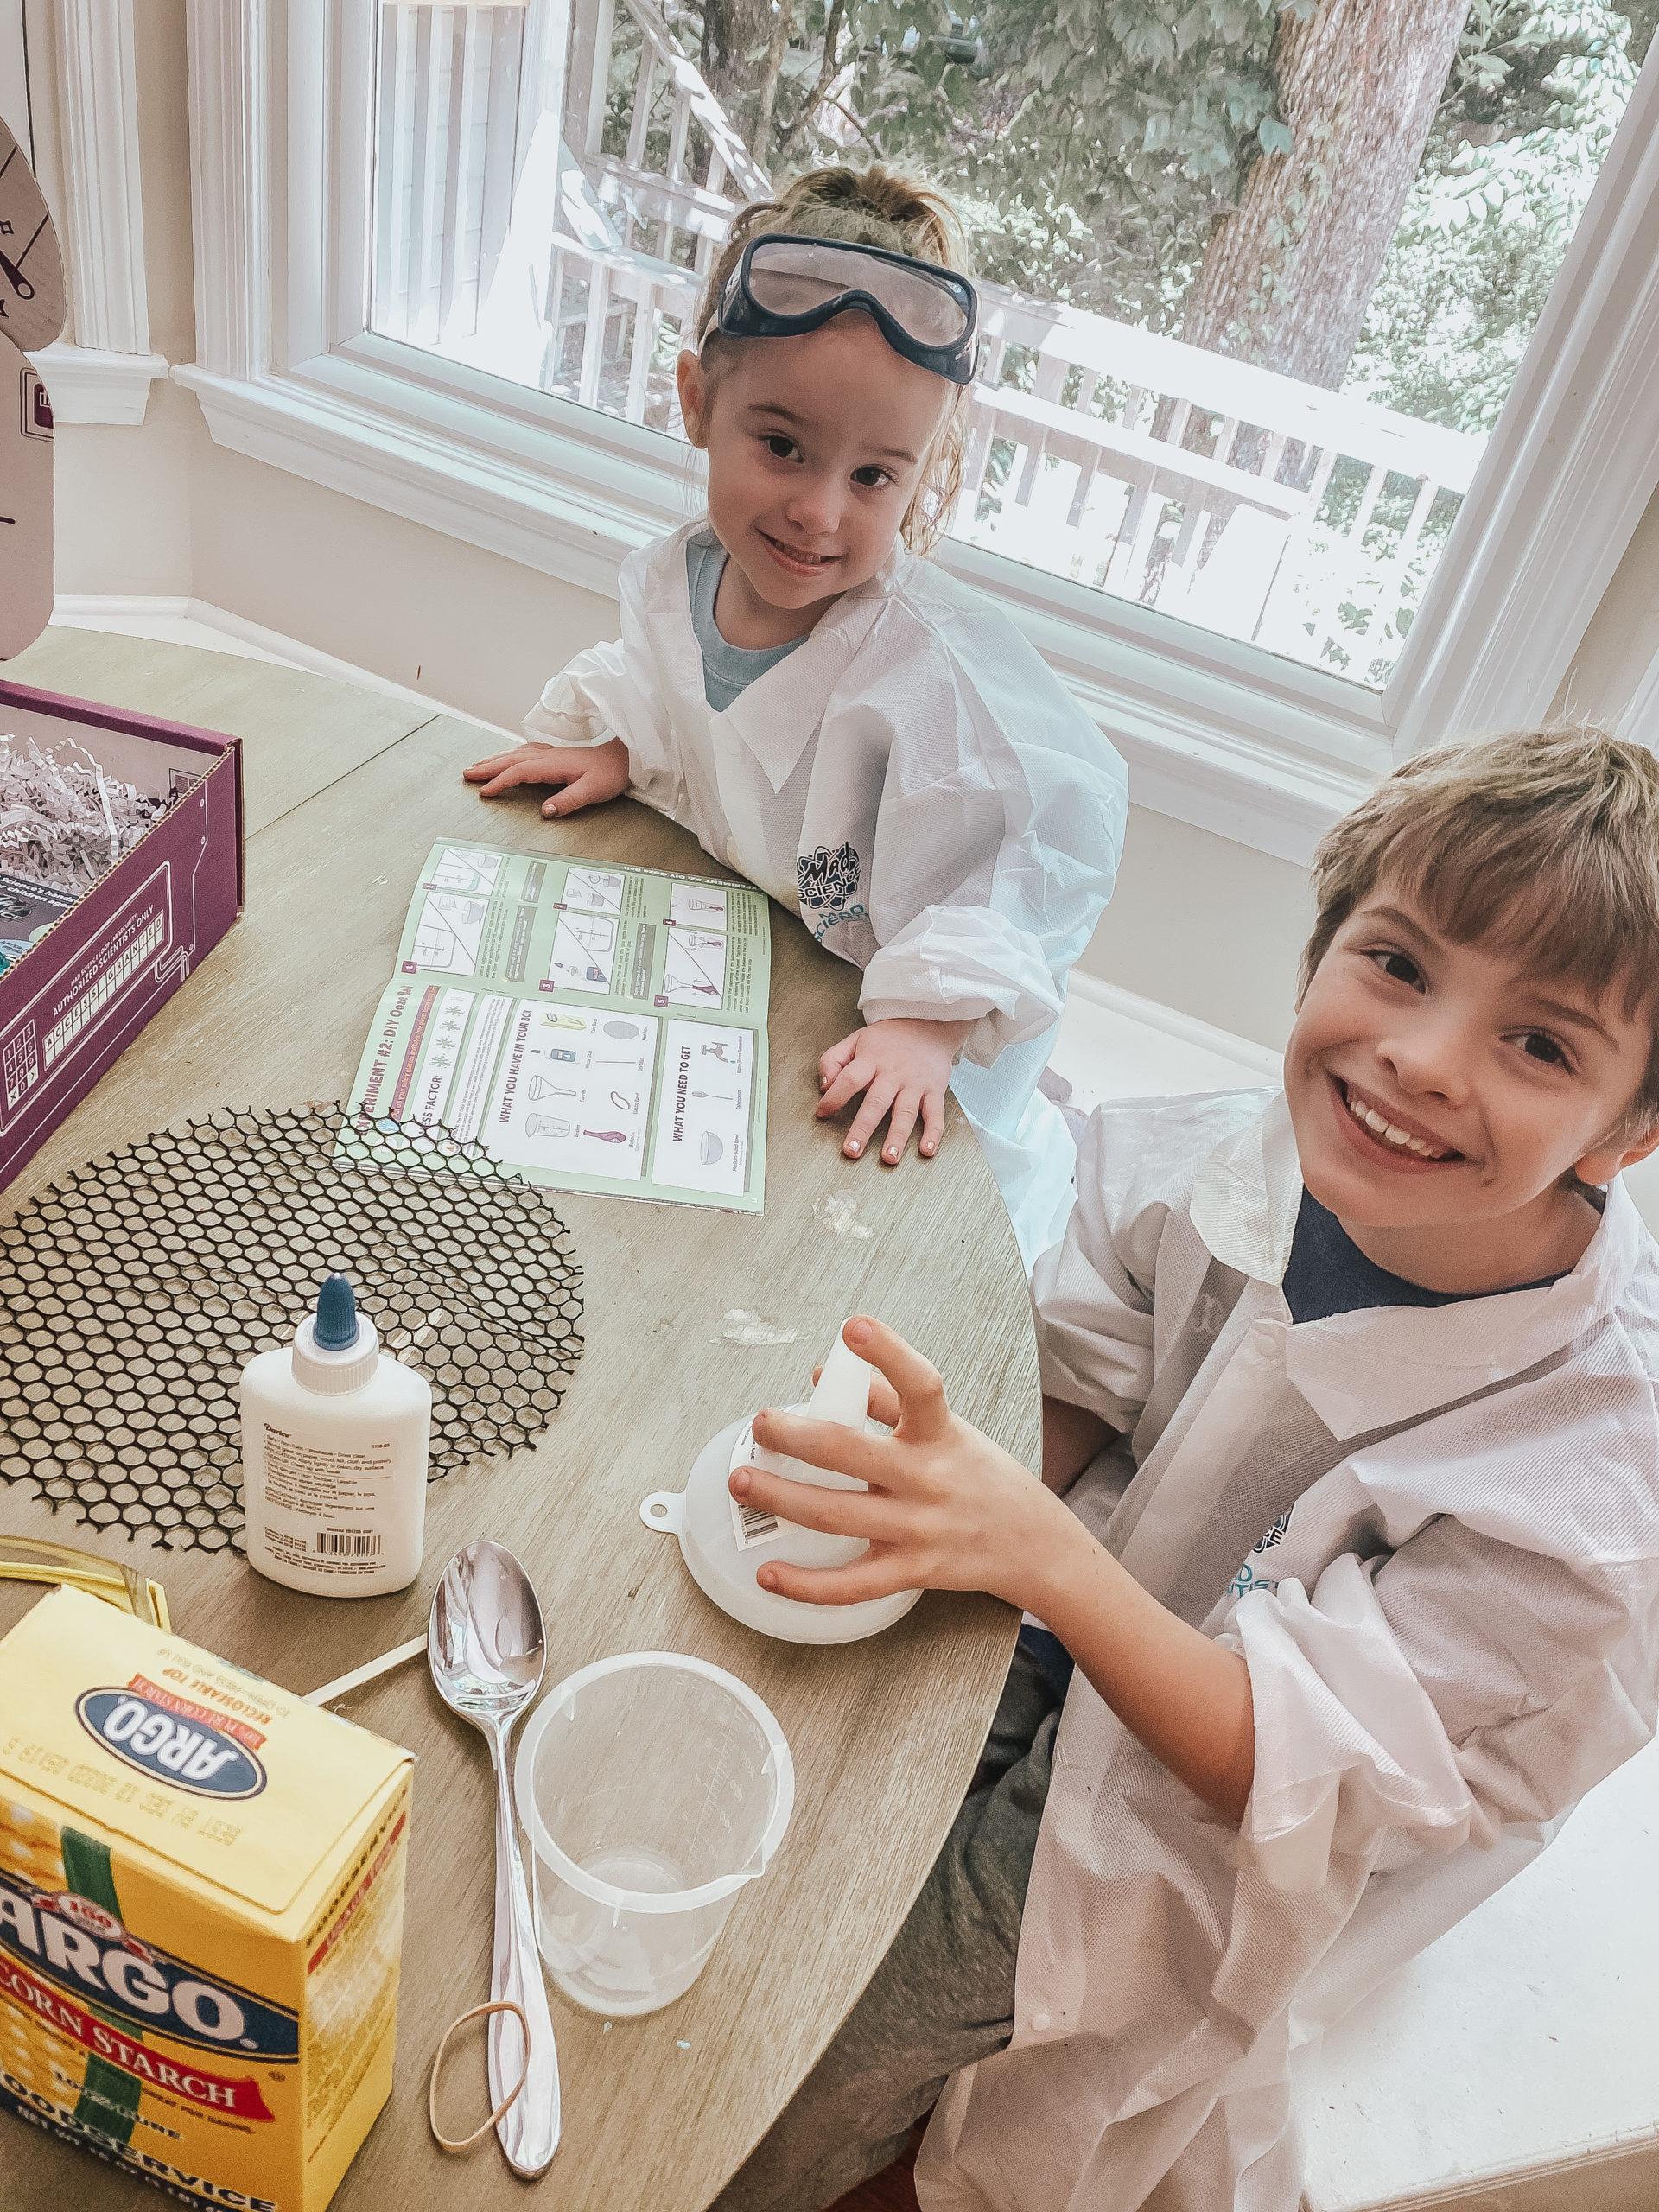 kids working on stm